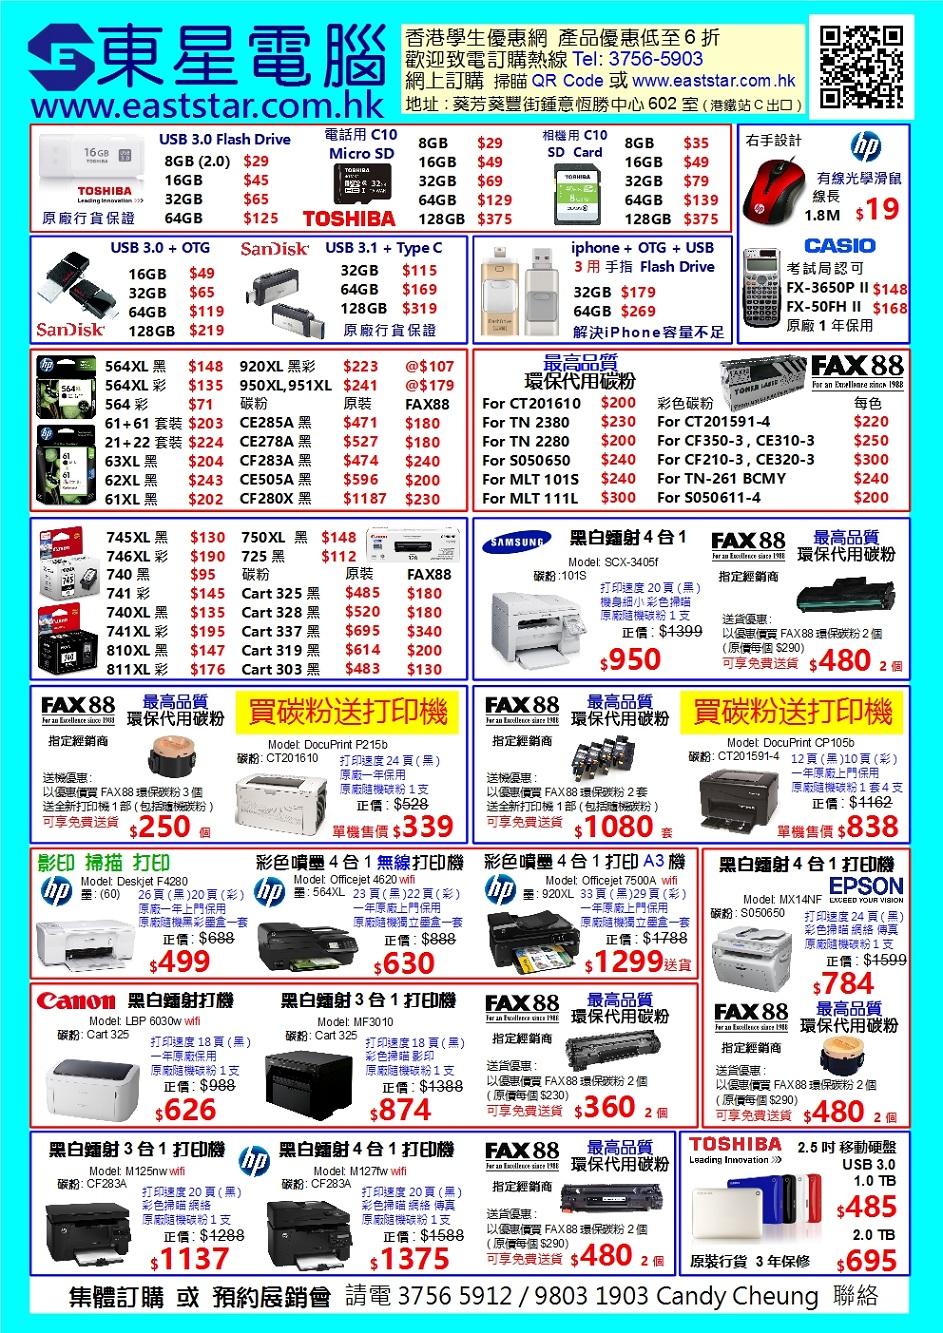 http://a100.com.hk/data/upload/shop/article/05264205866075691.jpg